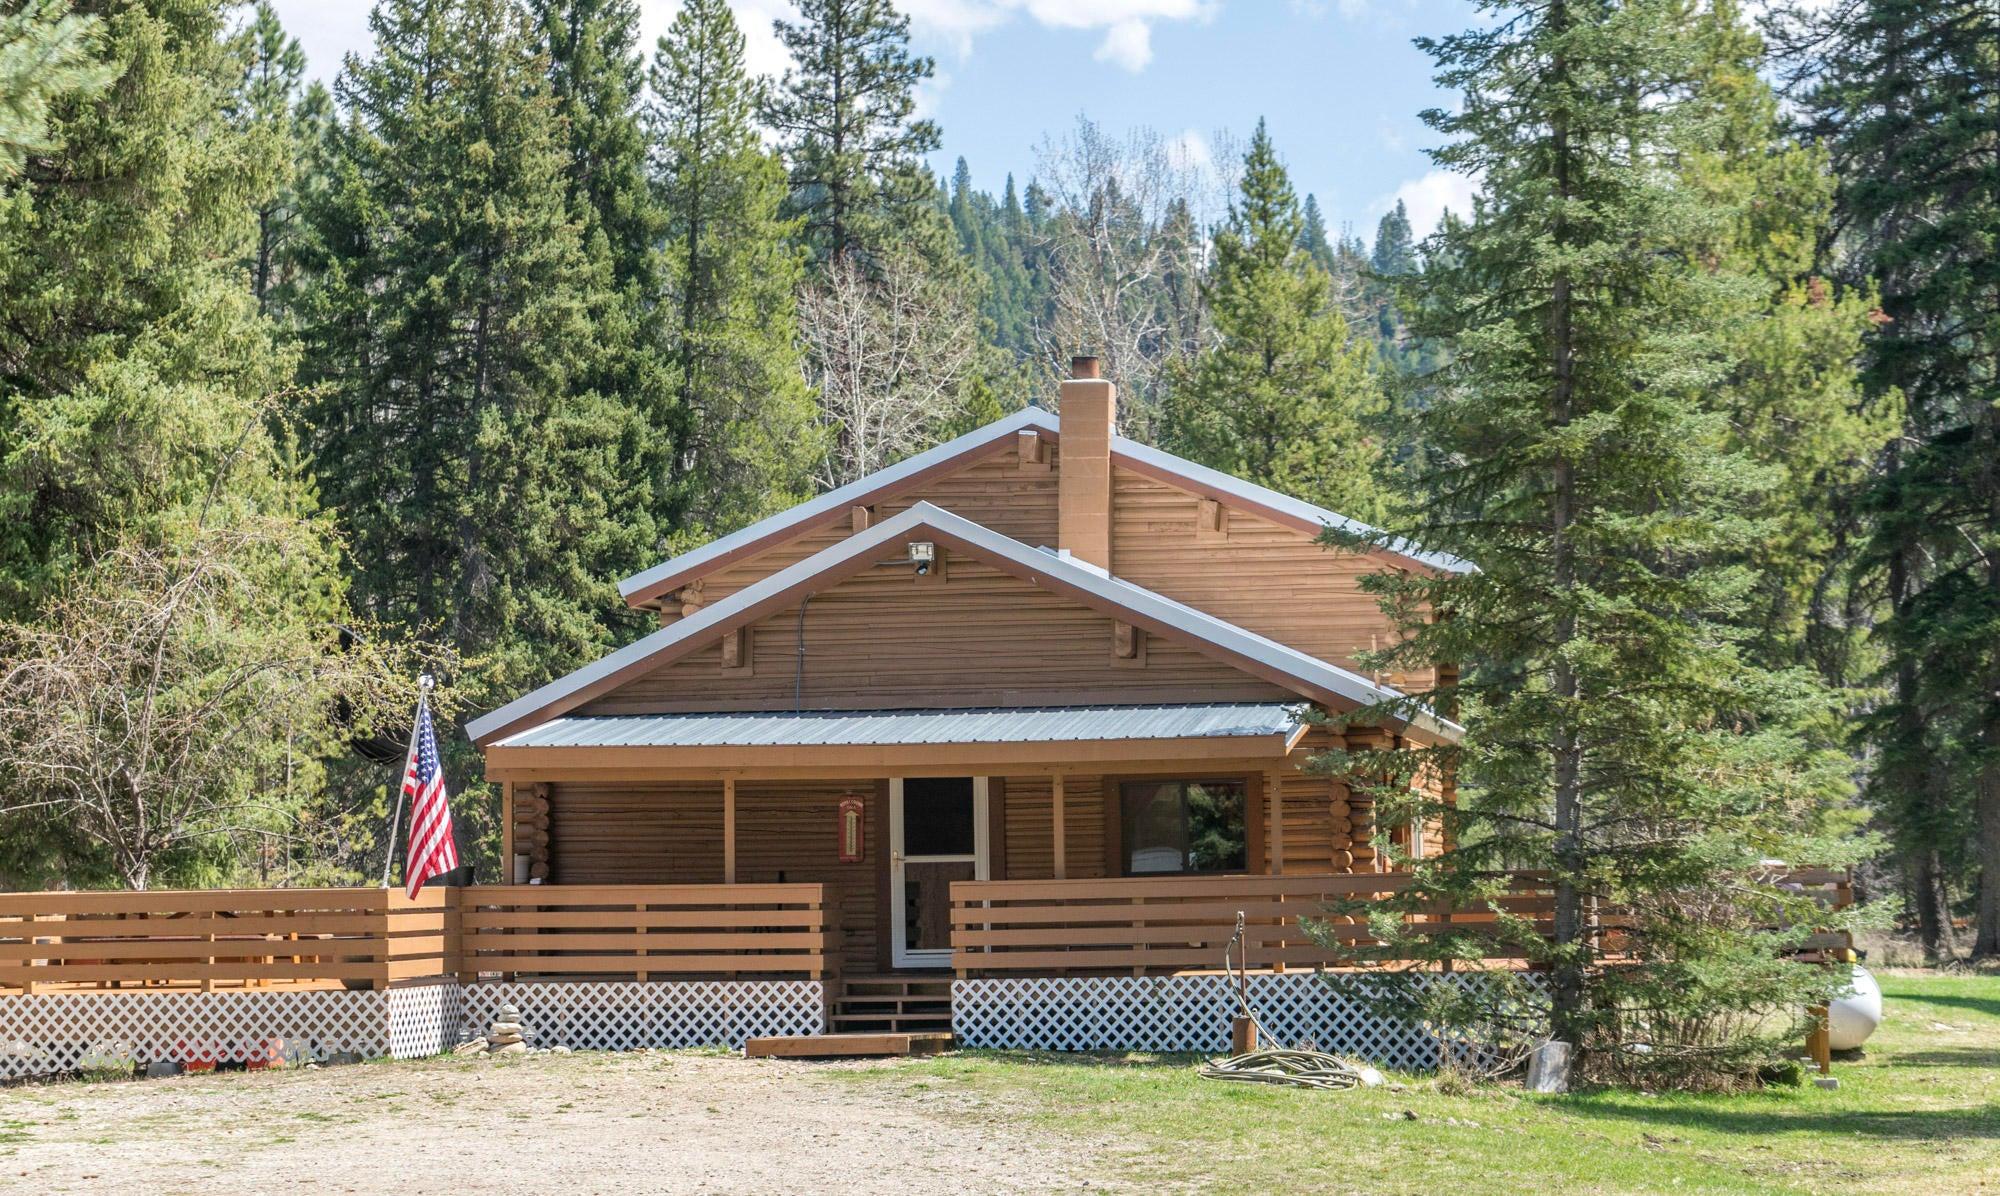 7013 Bear Hollow Court, Darby, MT 59829